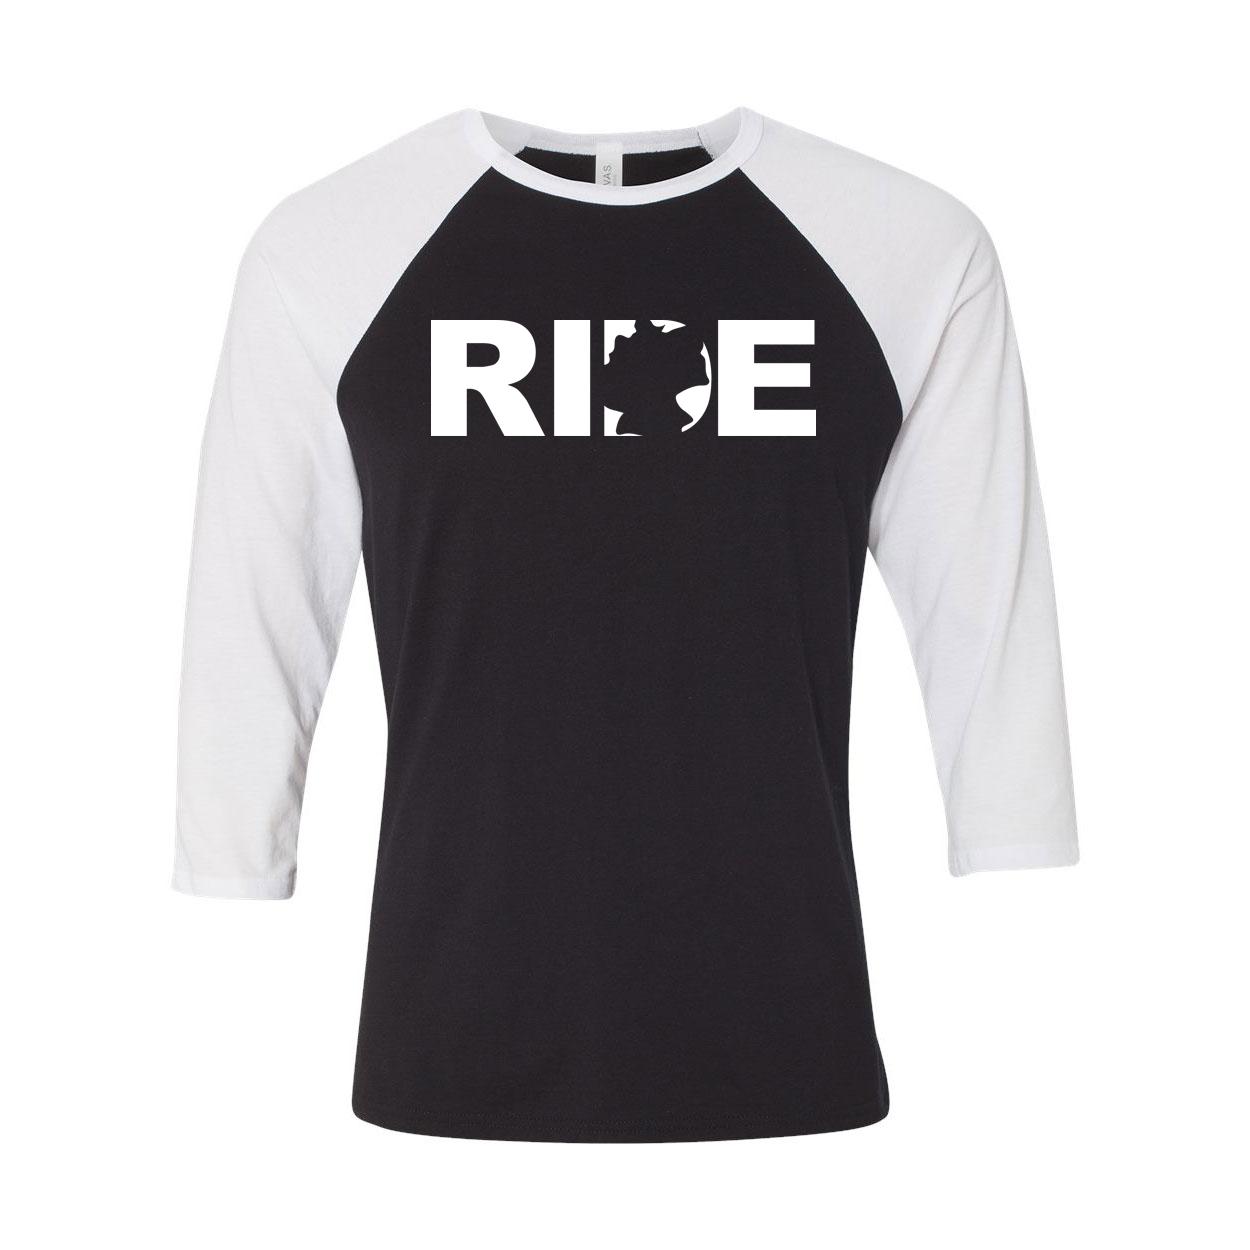 Ride Germany Classic Raglan Shirt Black/White (White Logo)